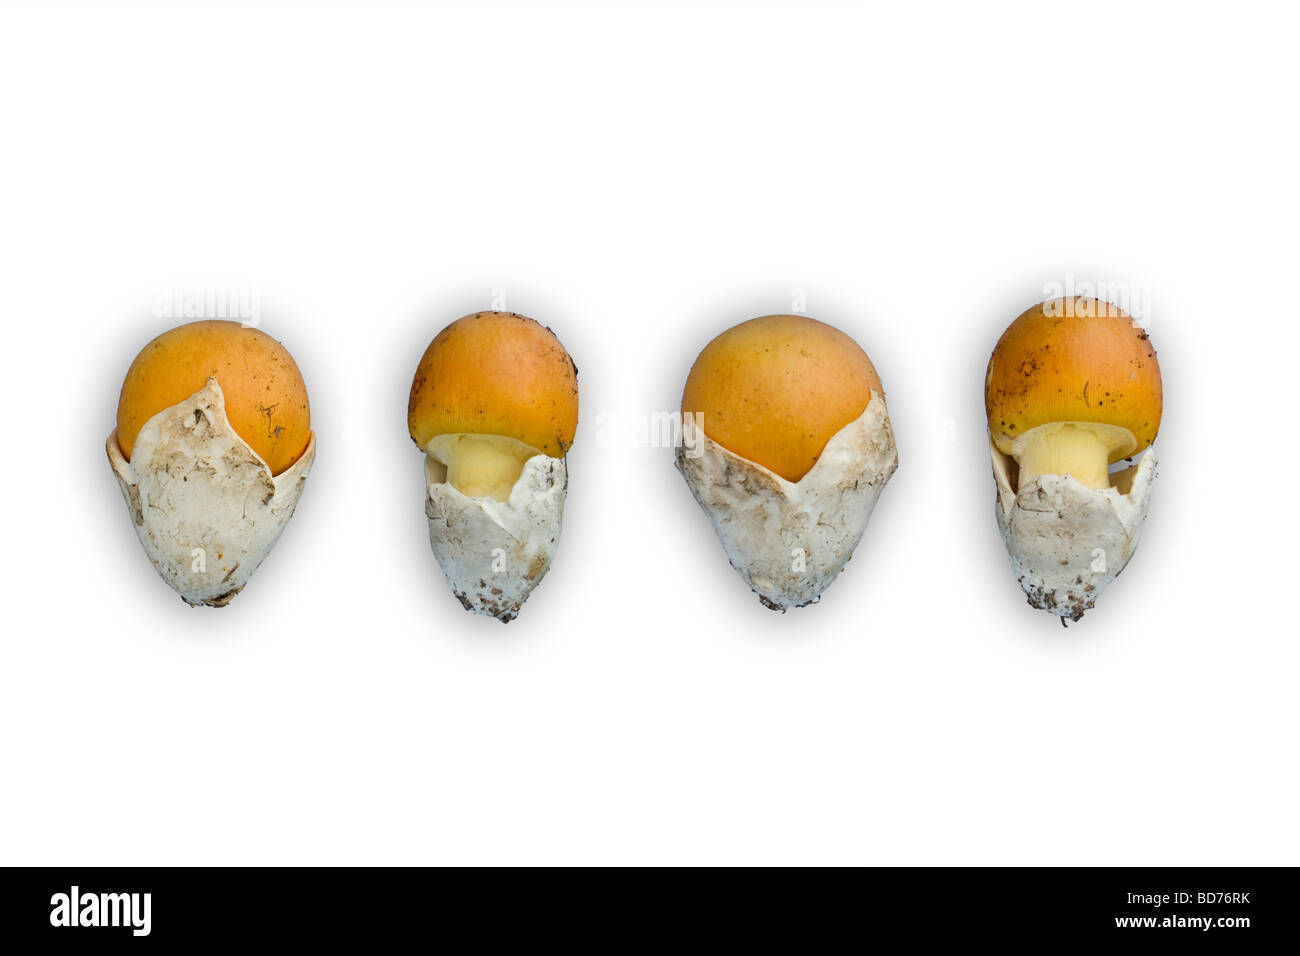 I giovani di Cesare funghi (Amanita cesarea) fotografato in studio (Francia). Jeunes oronges photographiées en studio. Foto Stock